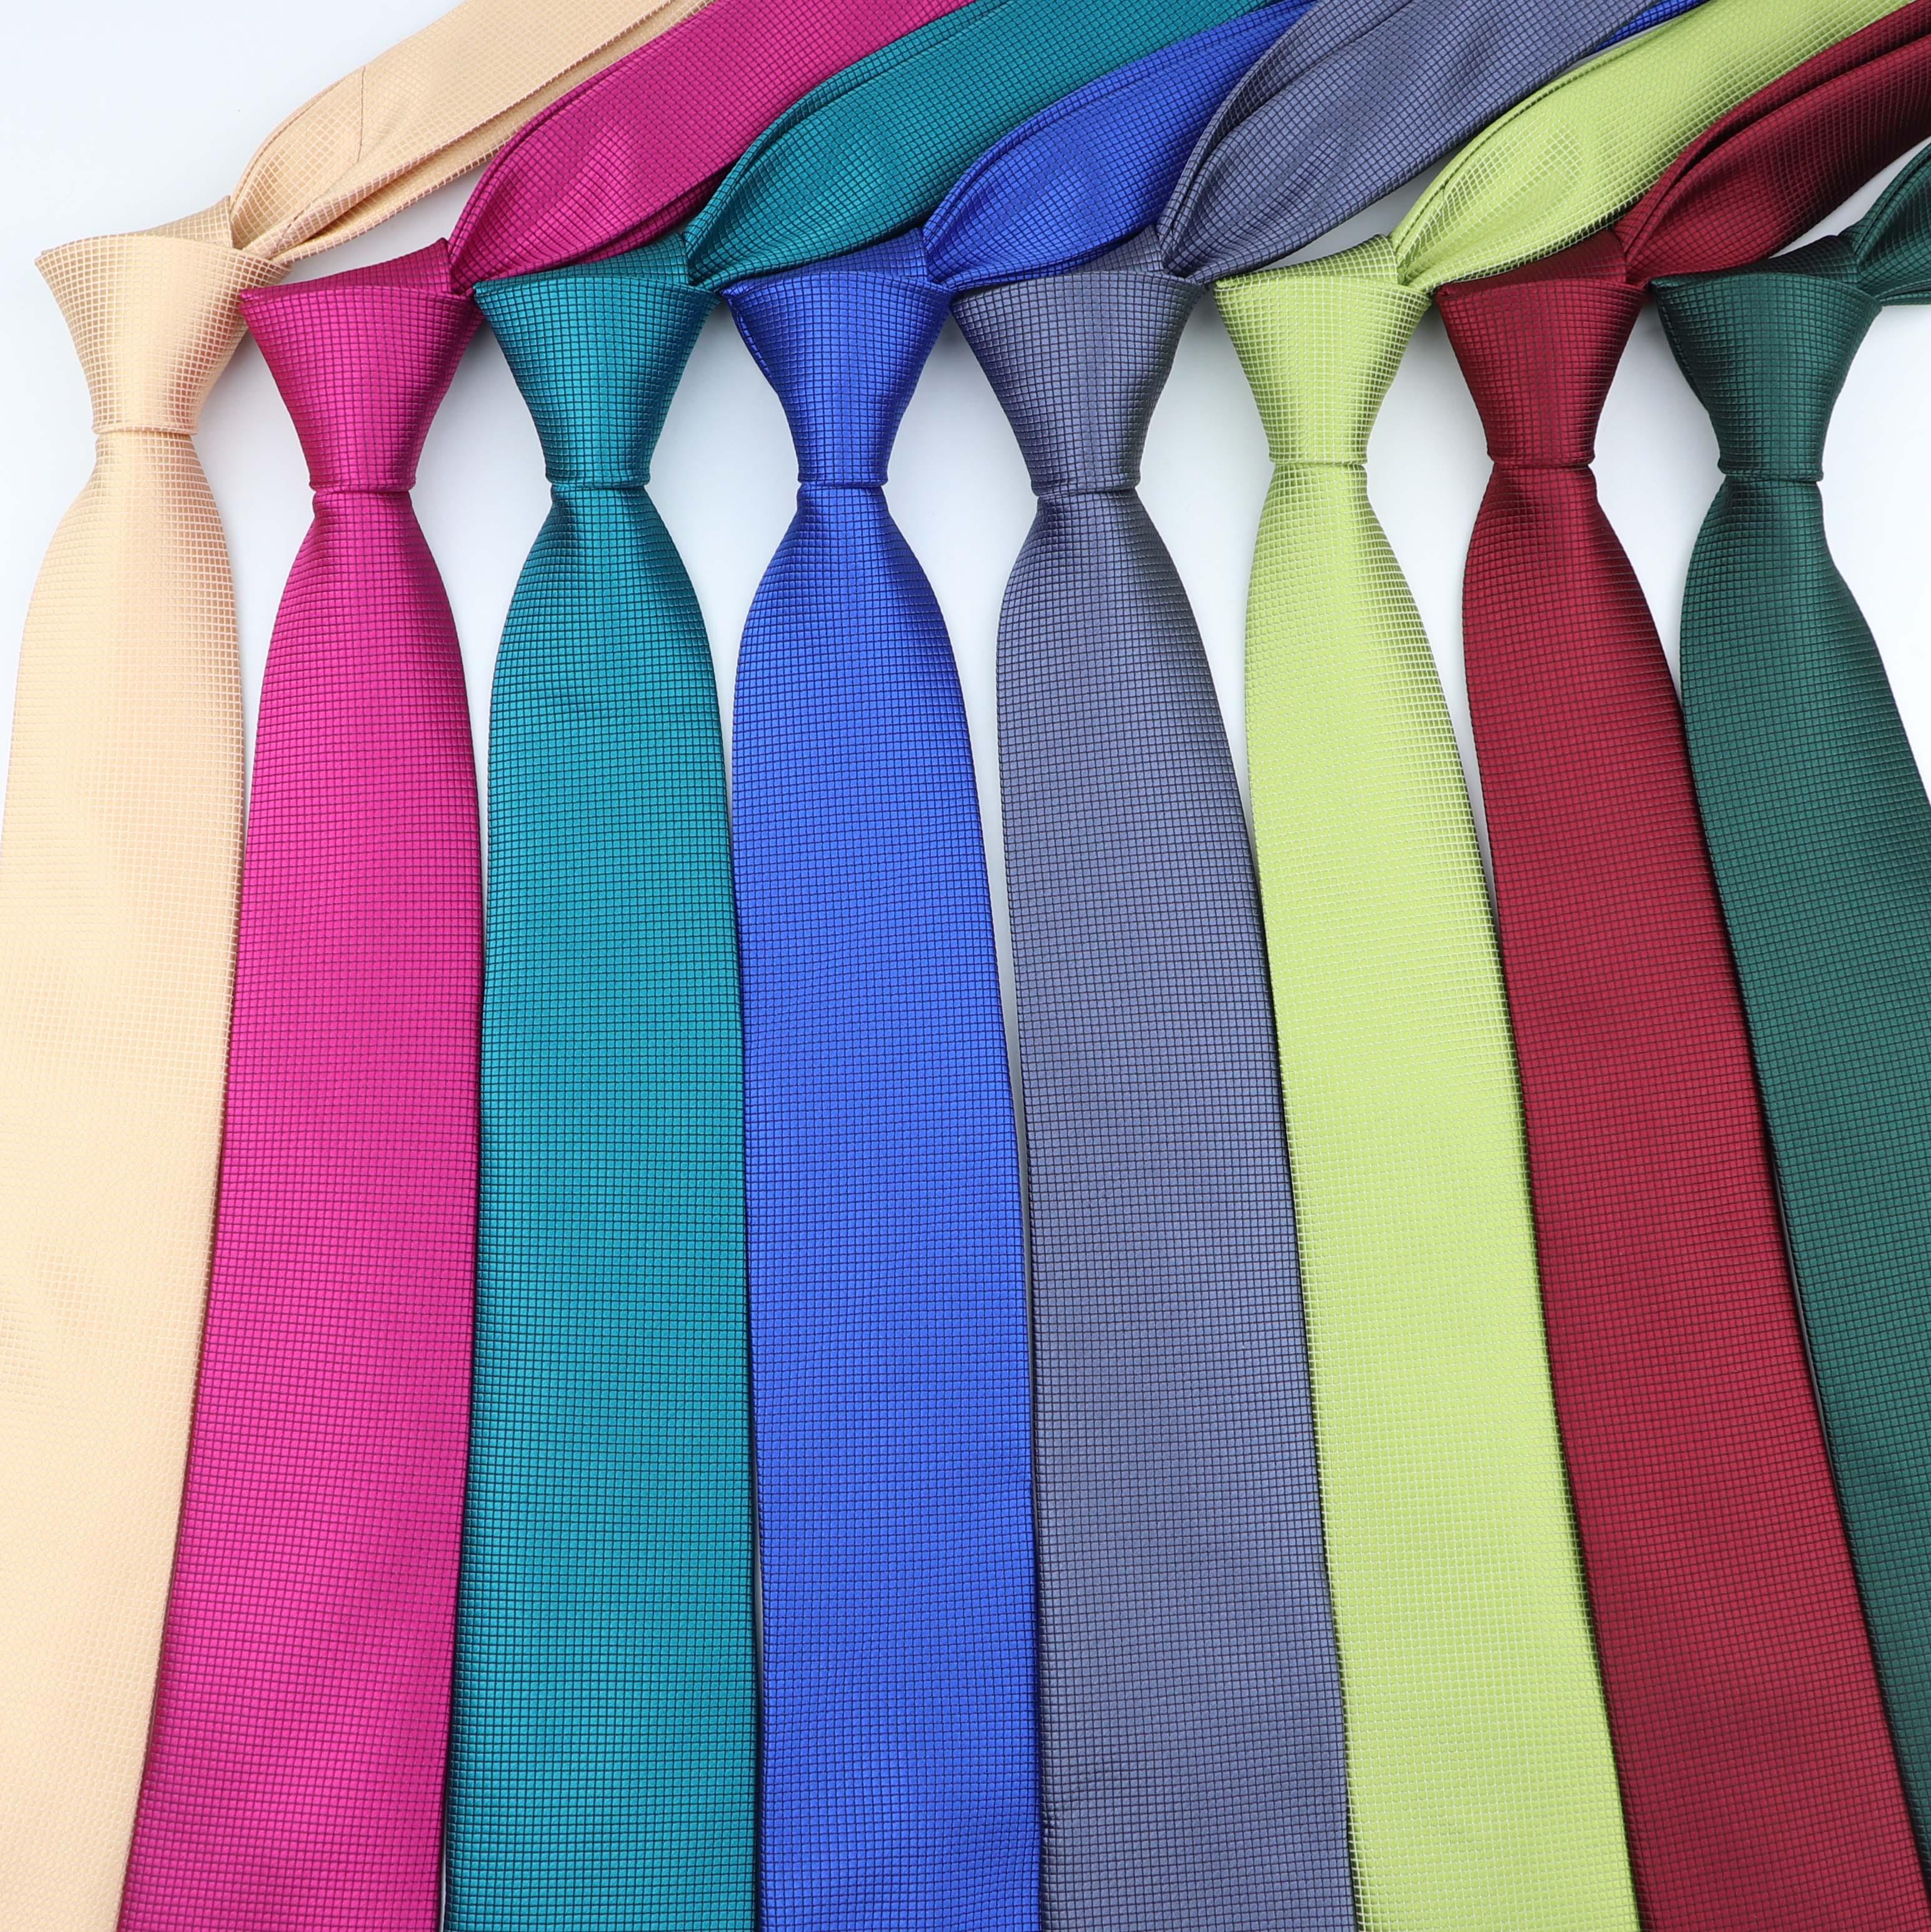 6cm Mens Business Tie Formal Plaid Jacquard Polyester Necktie Narrow Classic Corbata Neckwear Gravata Wedding